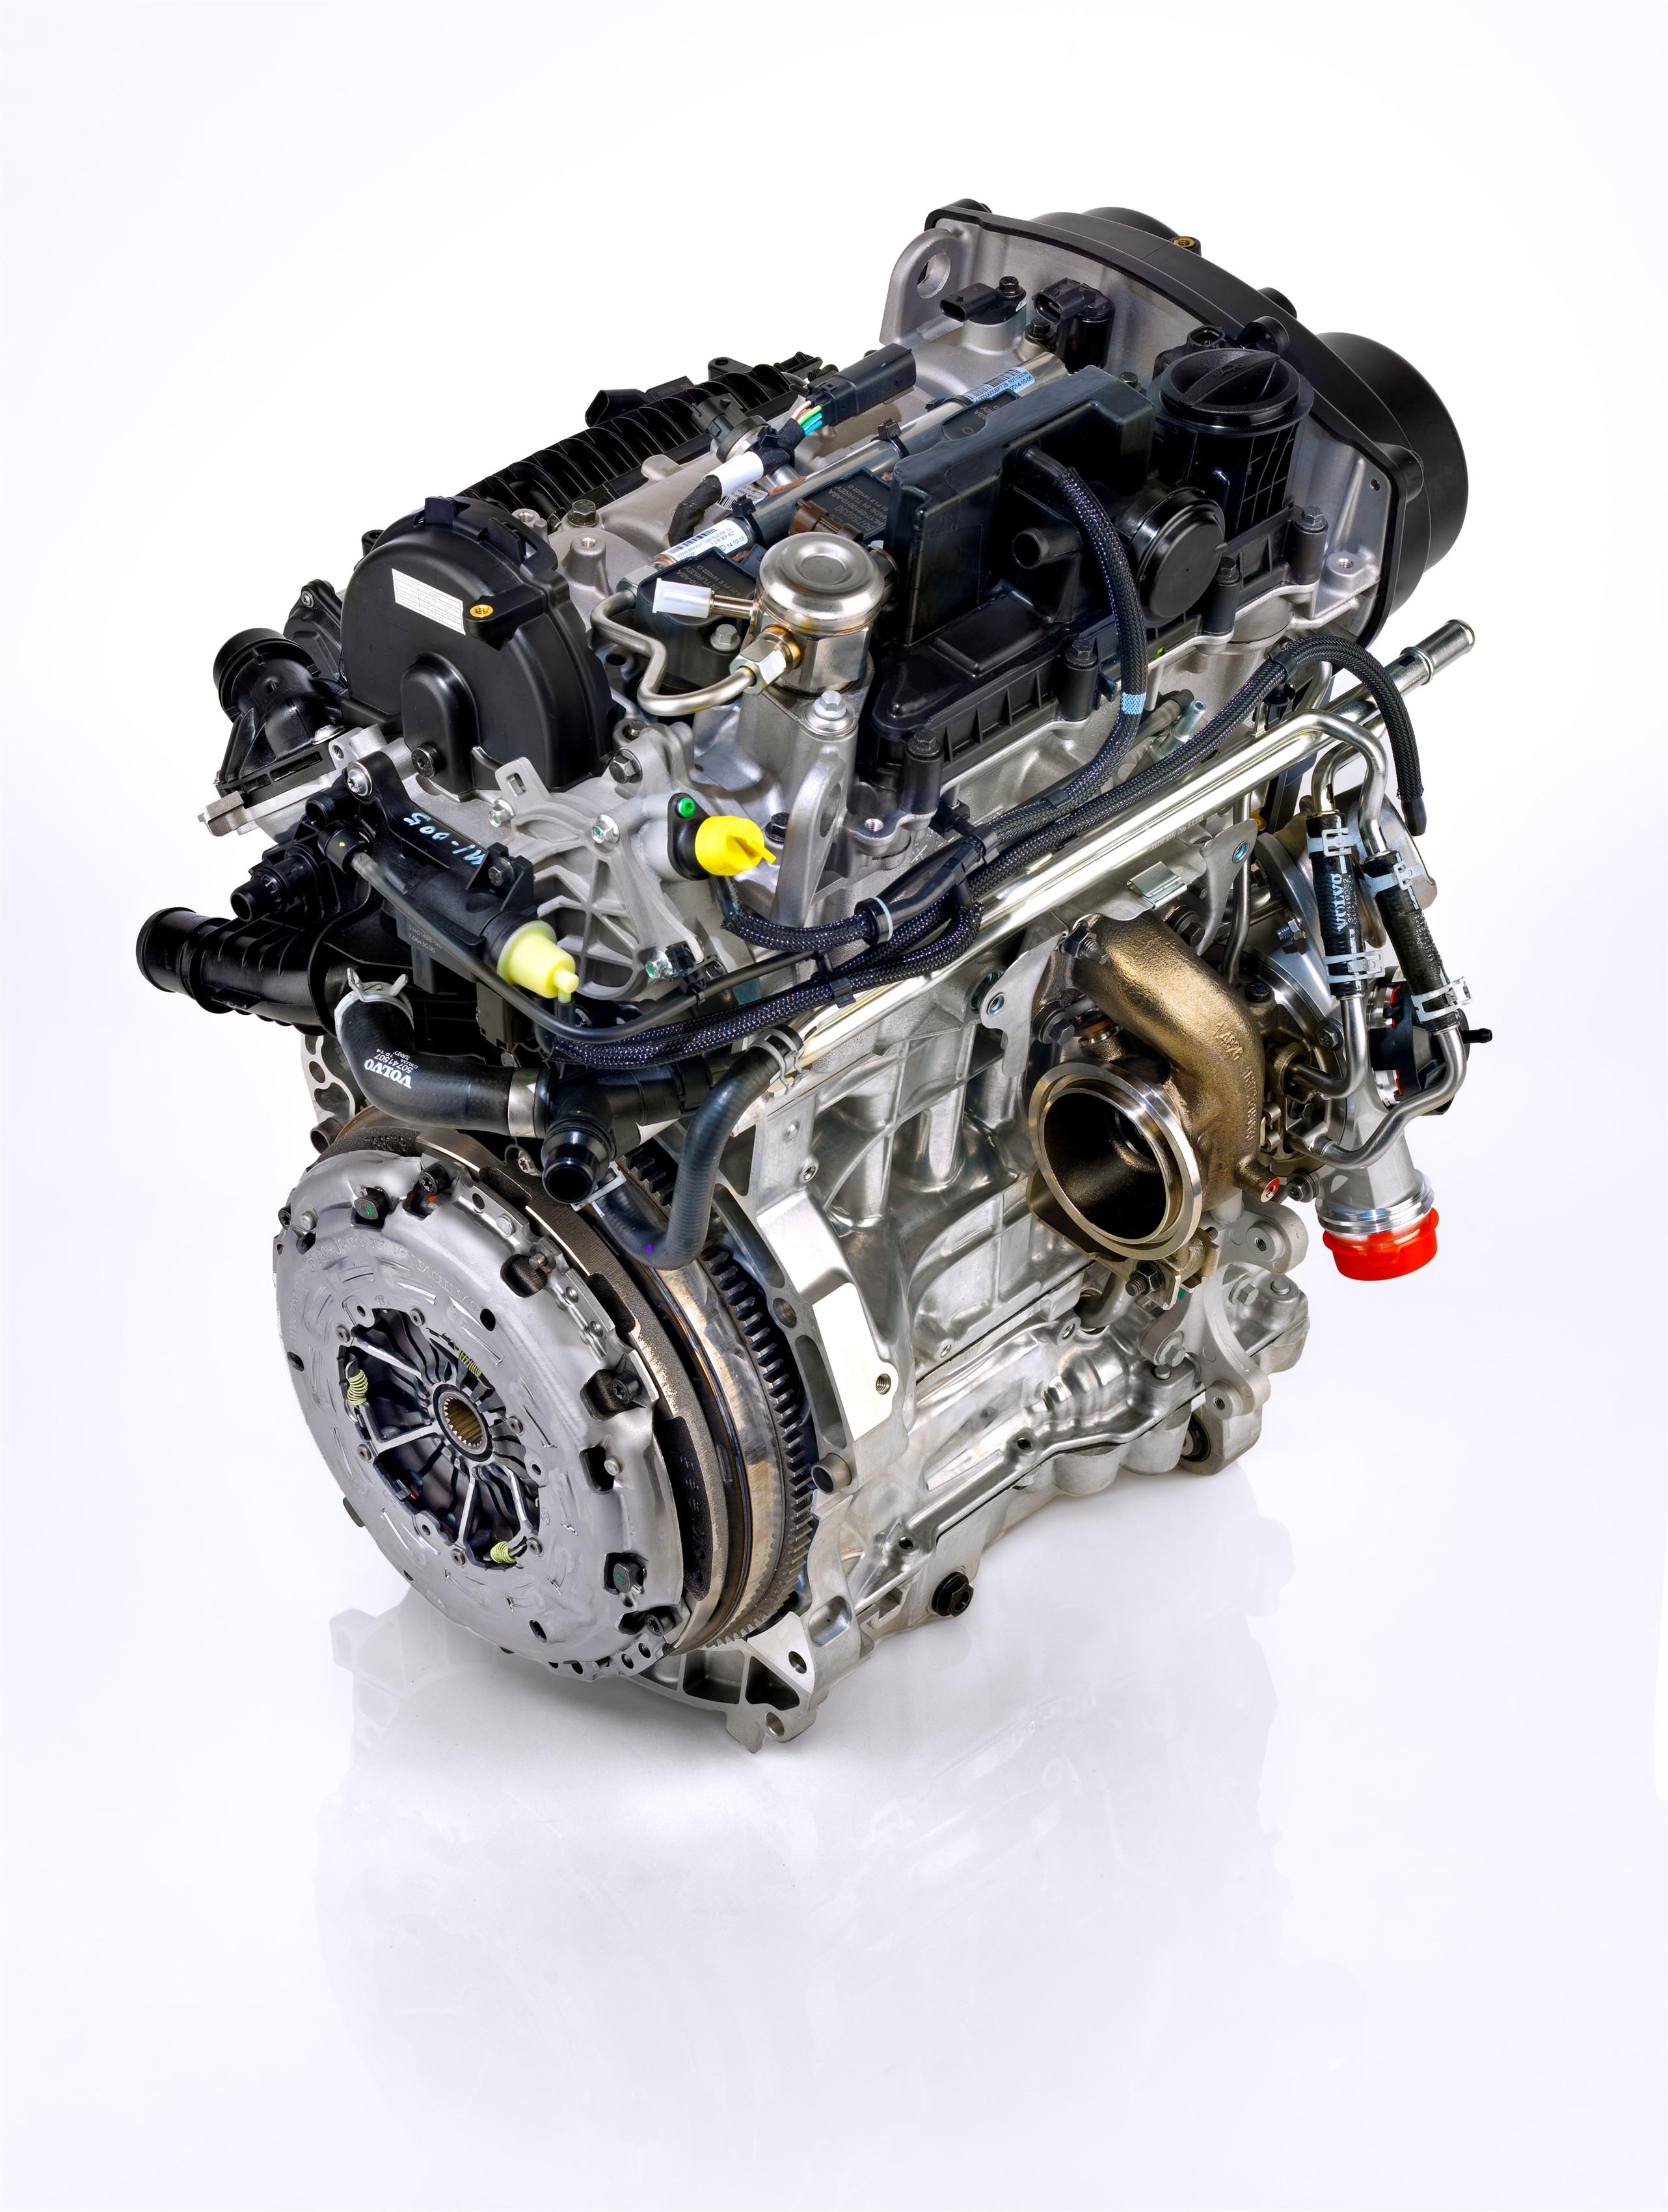 Volvo putting together 3 cylinder turbo petrol engine under Drive E range